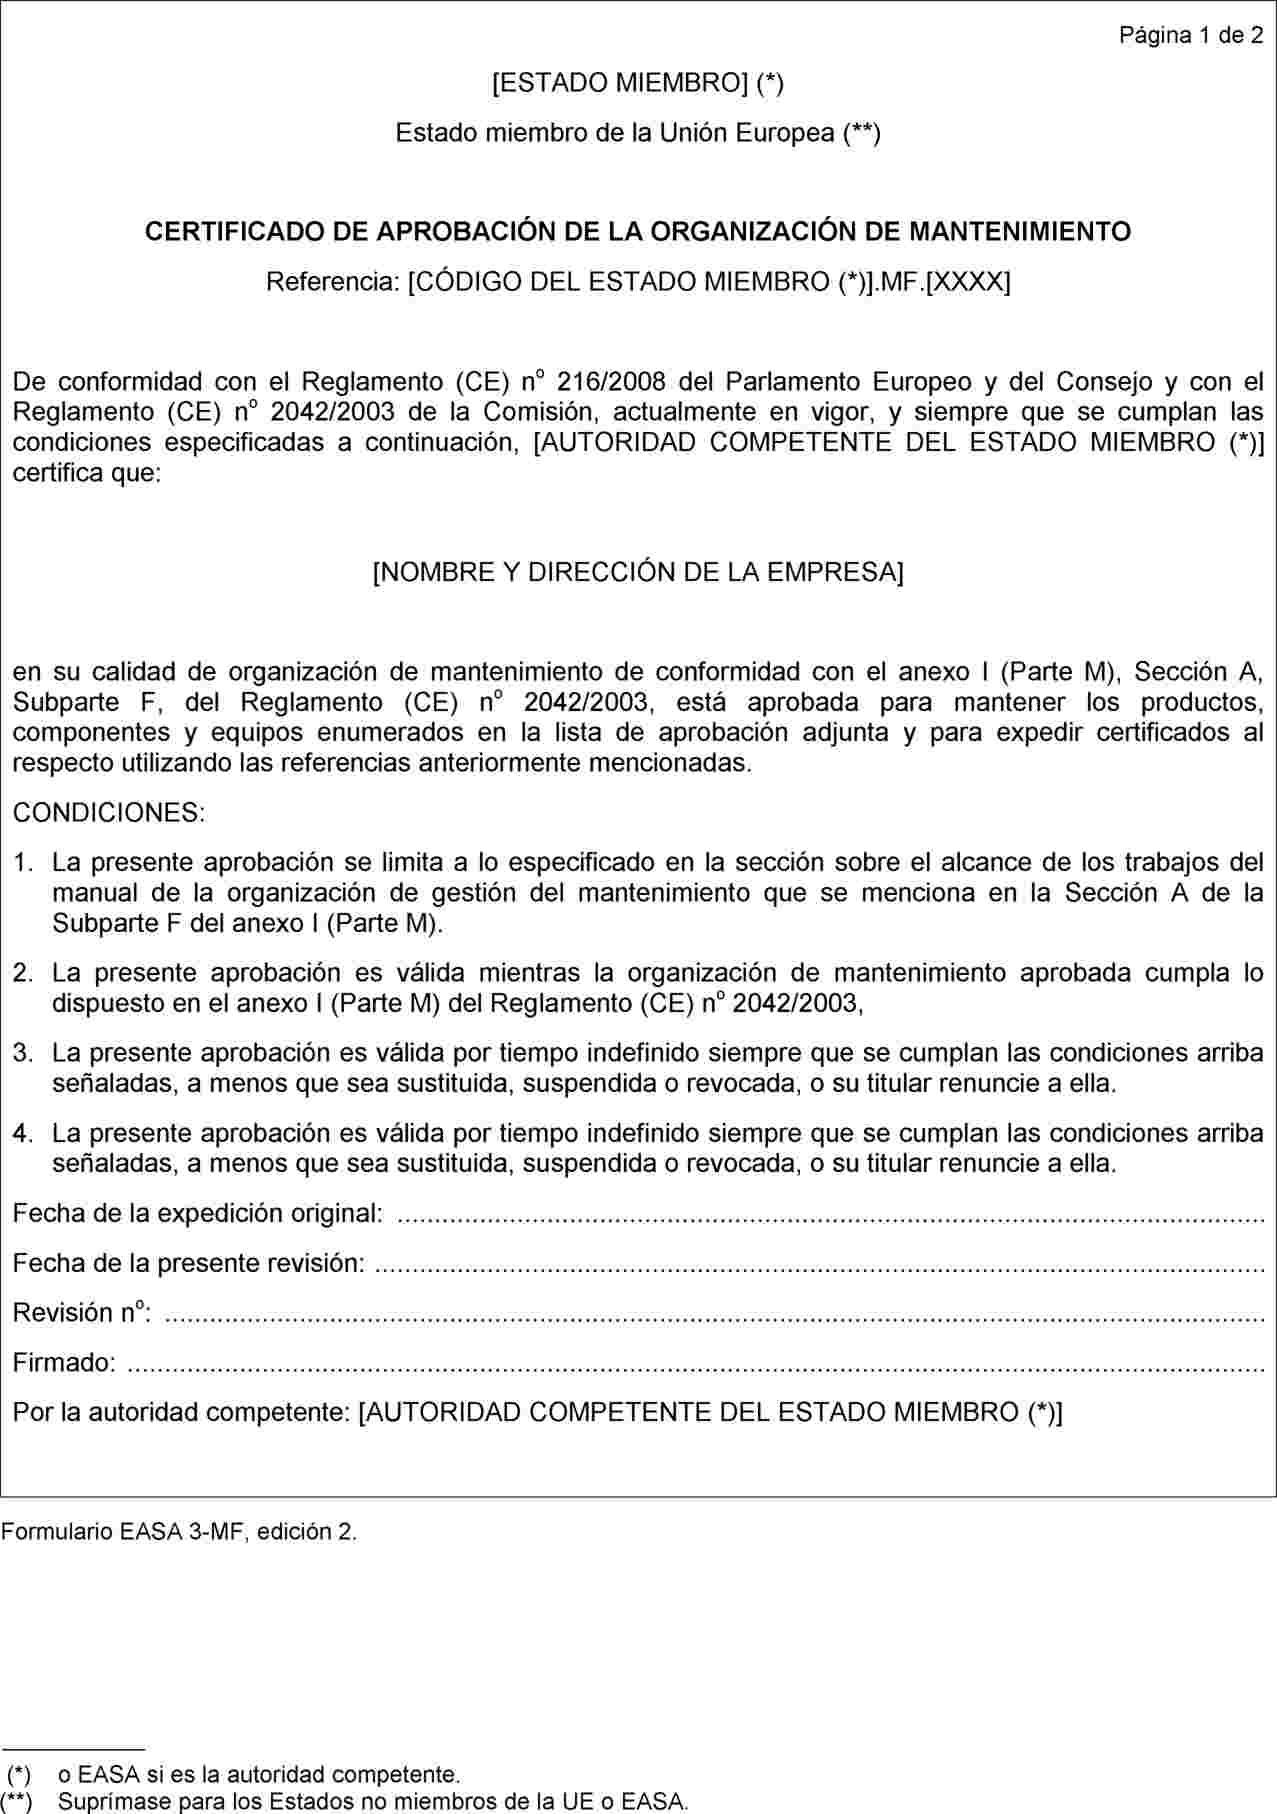 Imagen: https://eur-lex.europa.eu/resource.html?uri=uriserv:OJ.L_.2014.362.01.0001.01.SPA.xhtml.L_2014362ES.01005802.tif.jpg